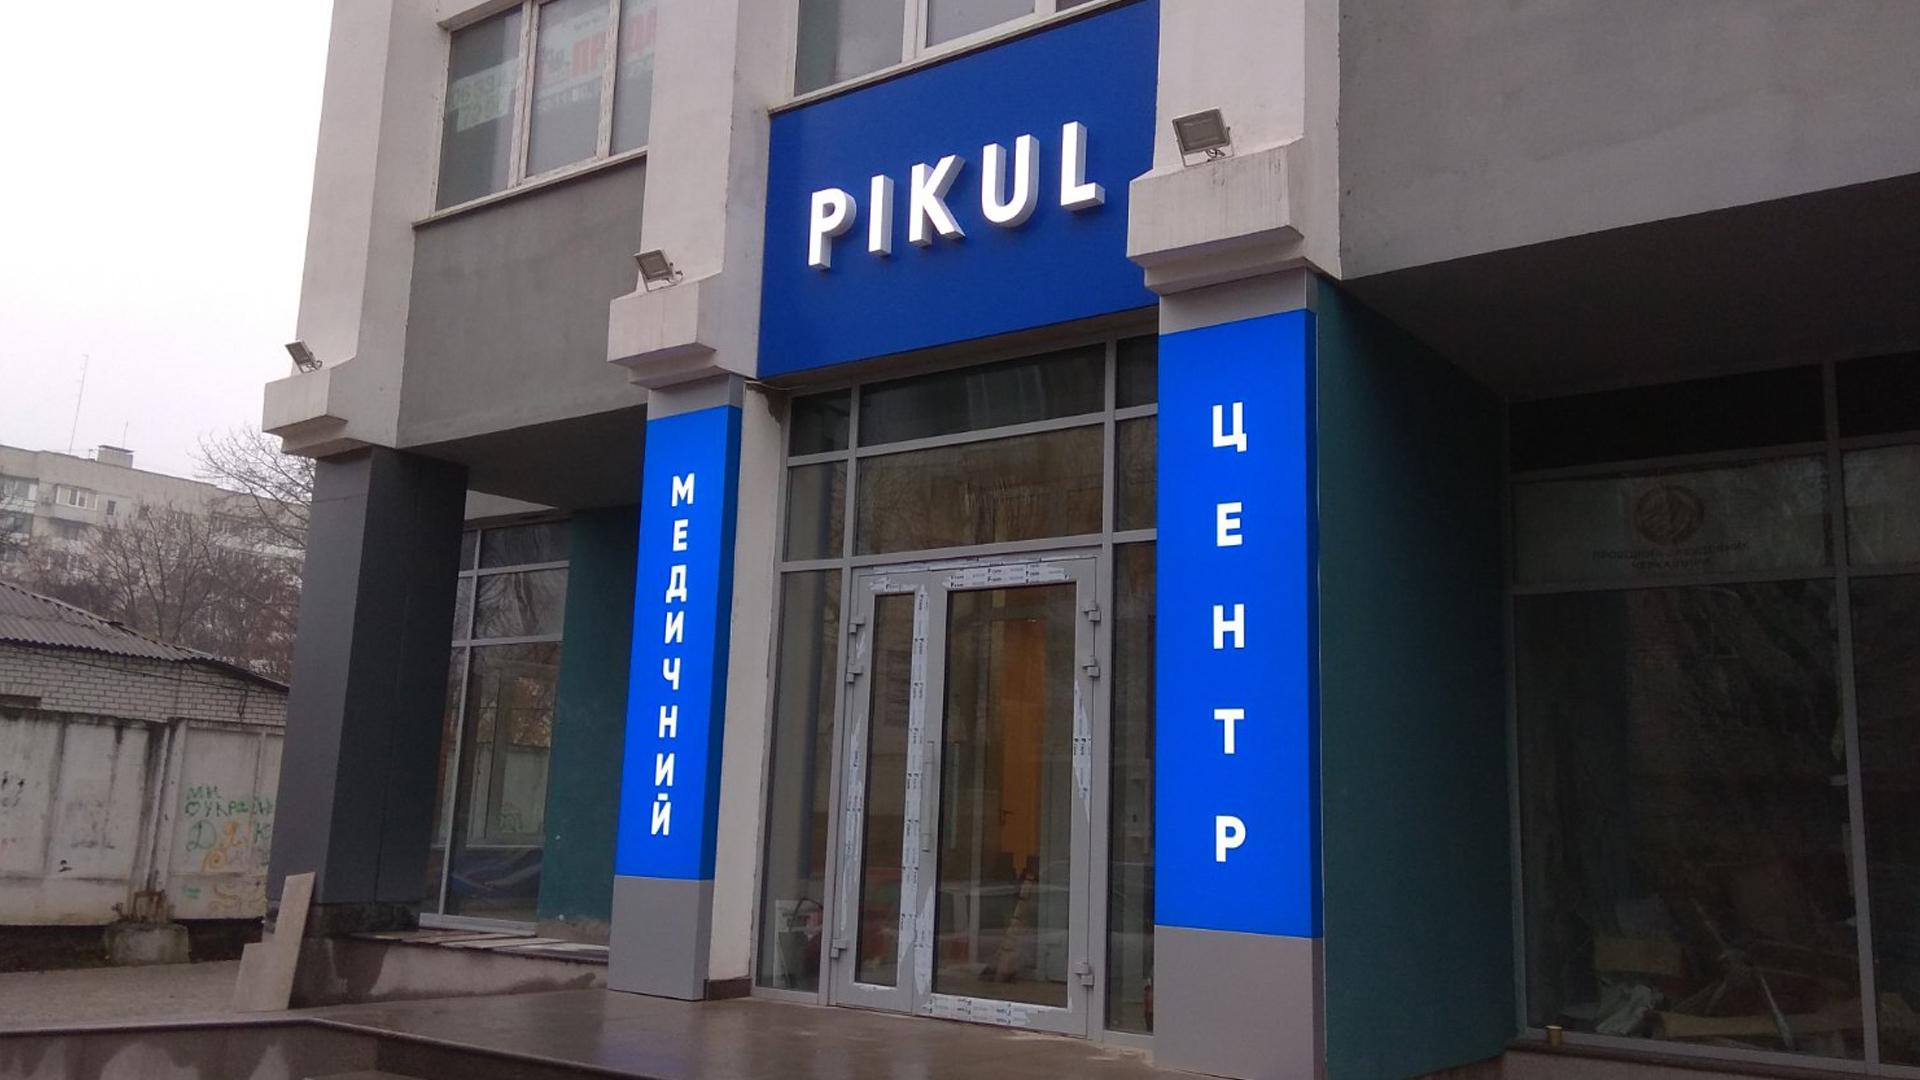 брендинг фасада буквами